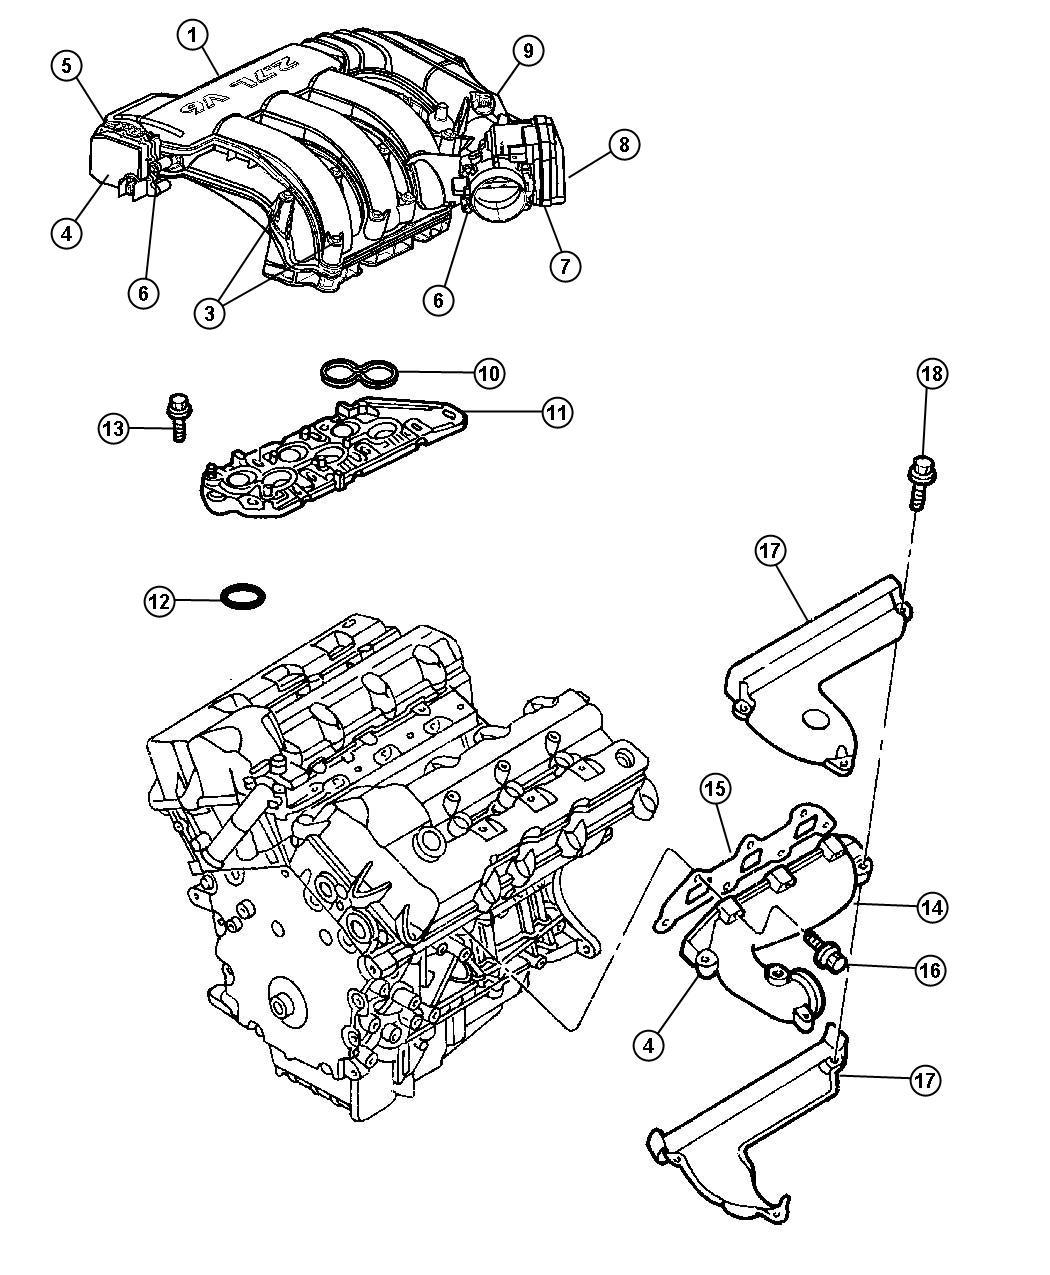 2005 Chrysler 300c 5 7 Hemi Engine Problems, 2005, Free